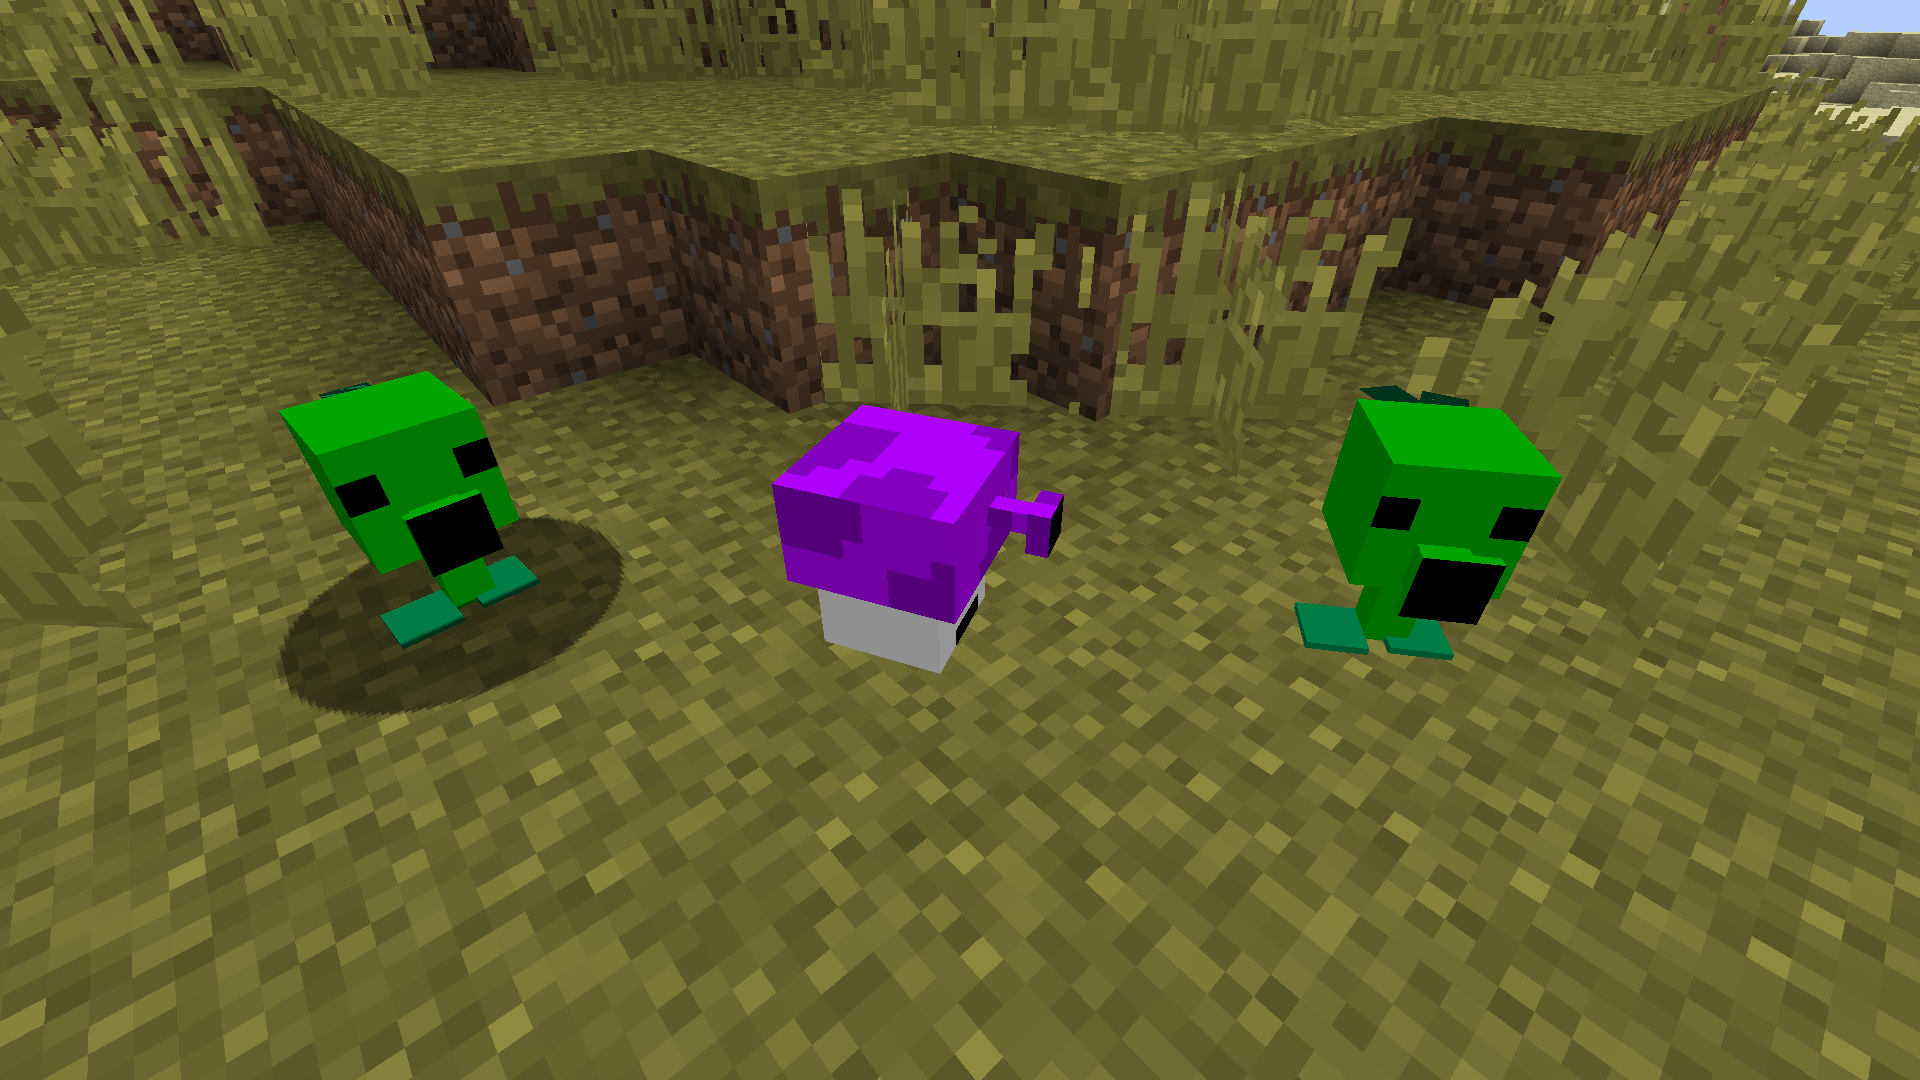 Plants vs zombies minecraft mod 1.12